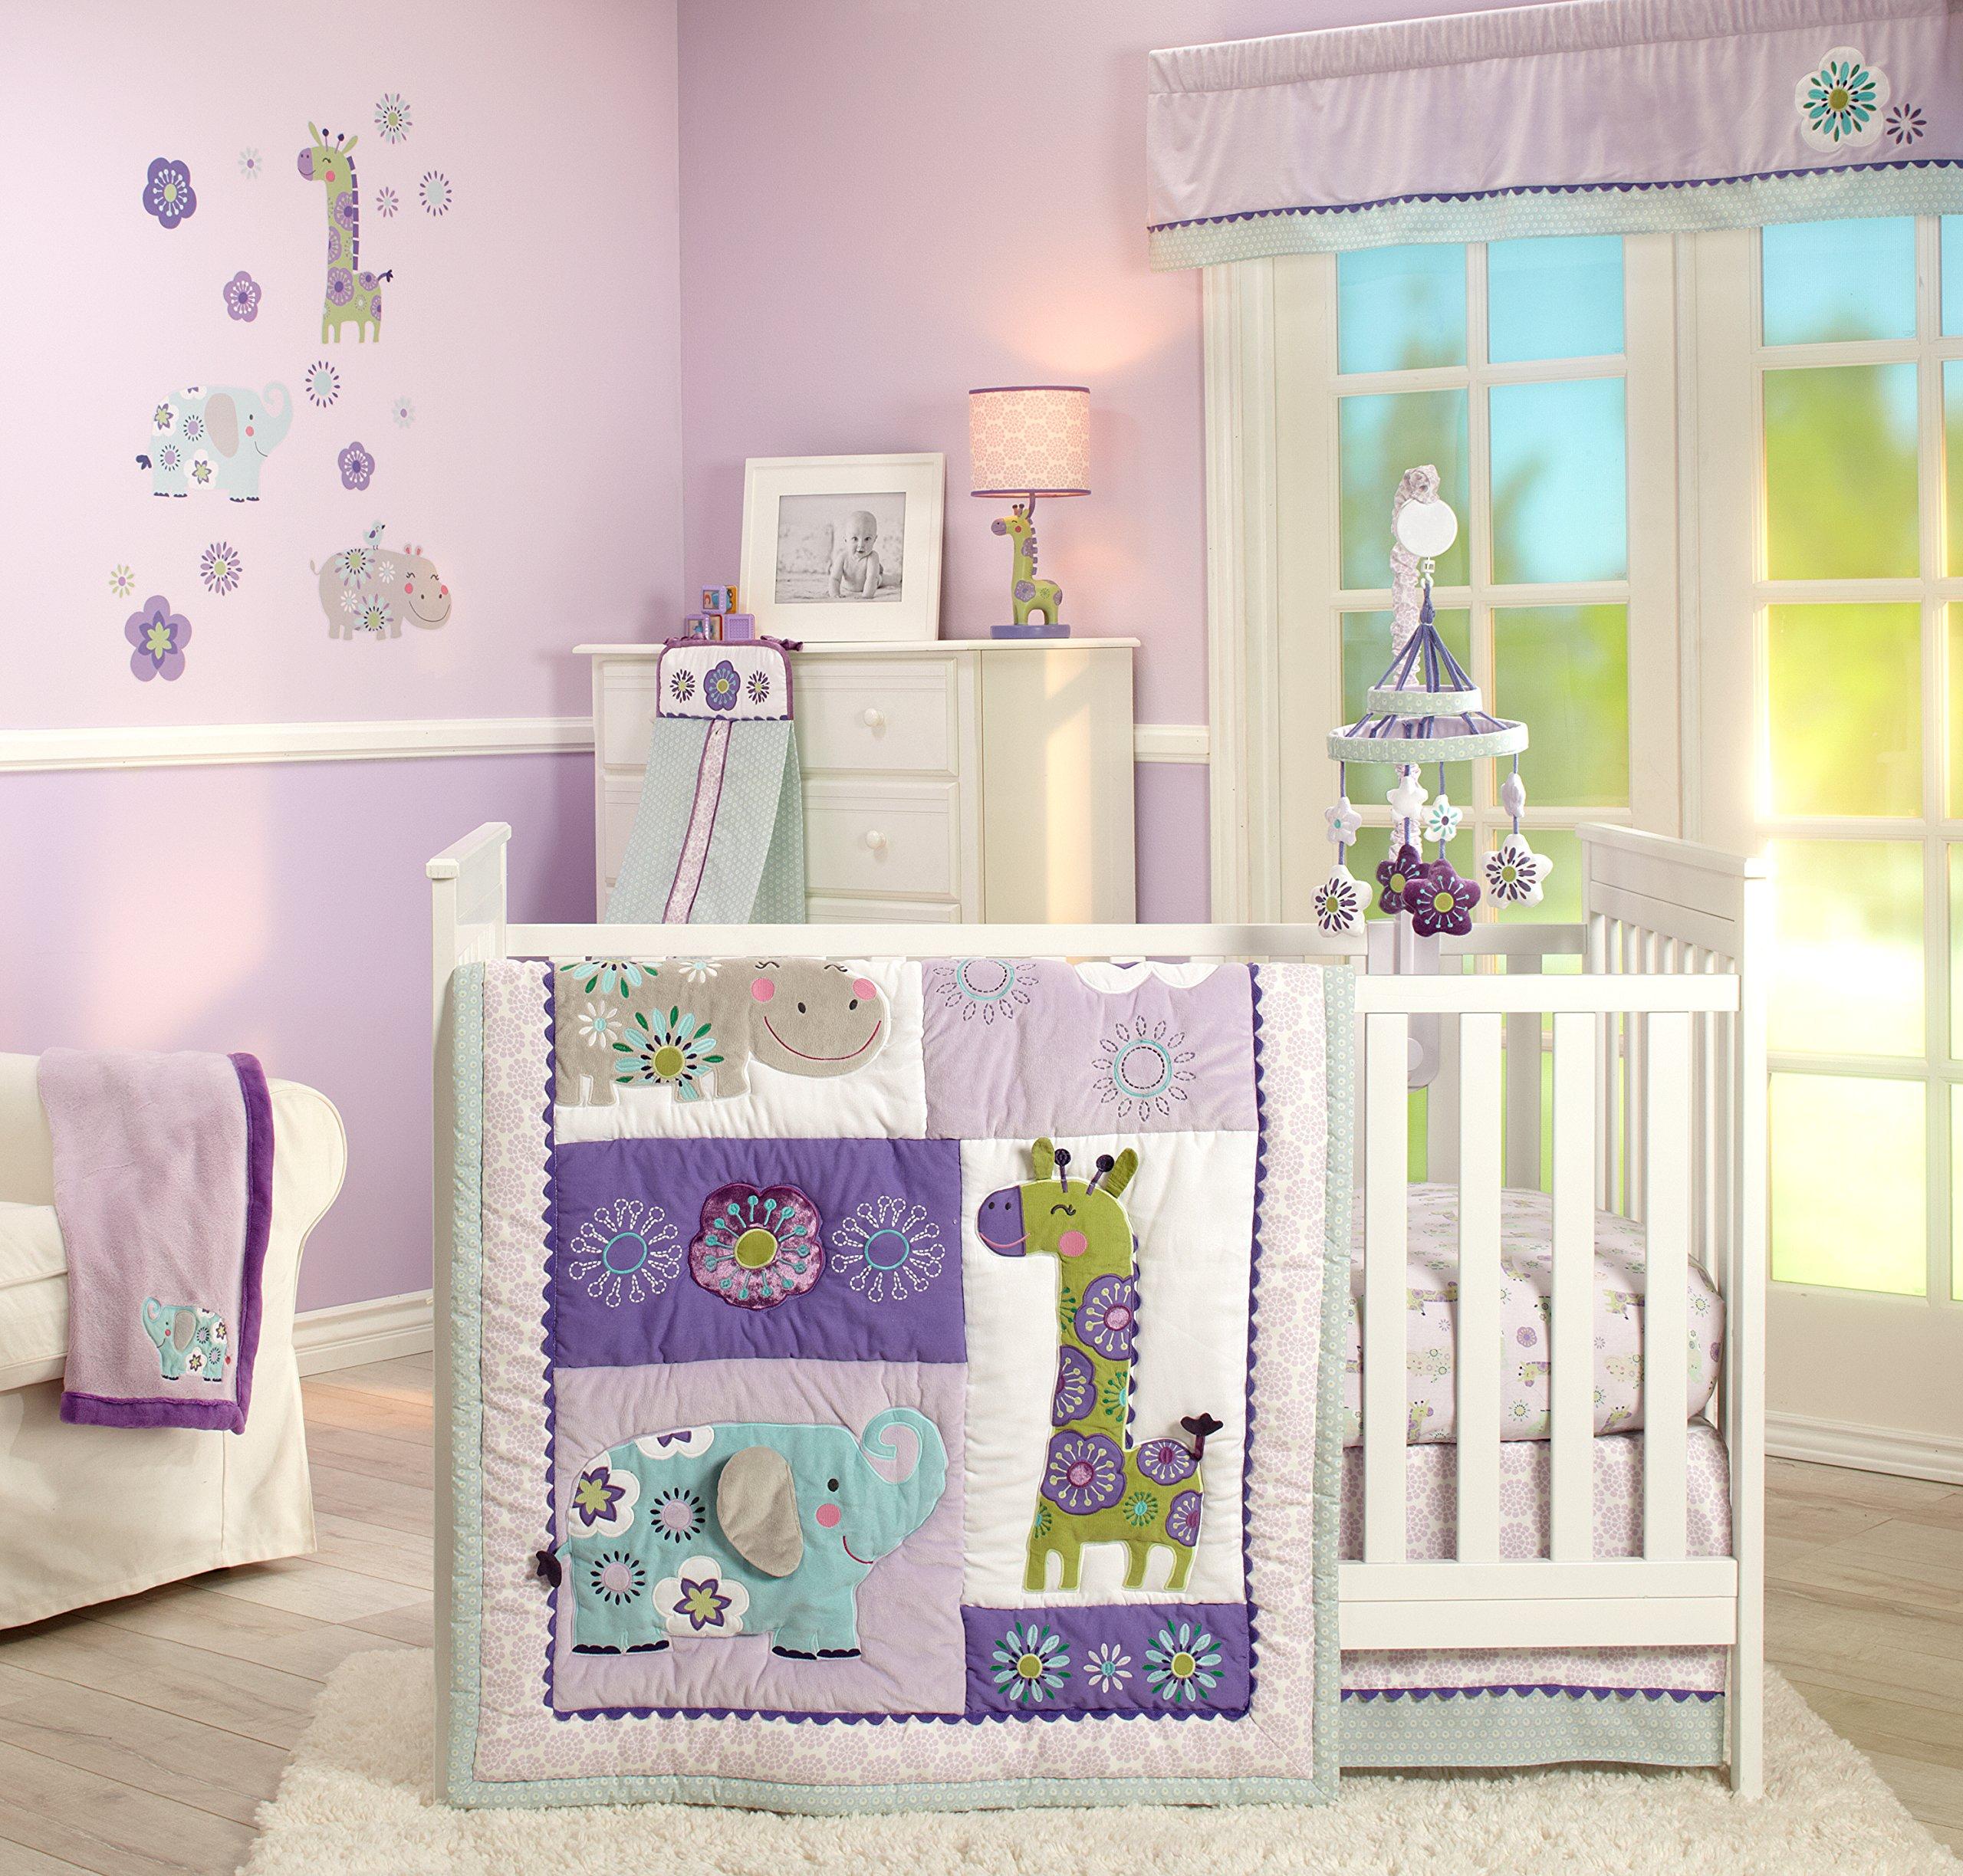 Carter's Zoo Jungle/Safari 4 Piece Nursery Crib Bedding Set, Lavender/Aqua/White